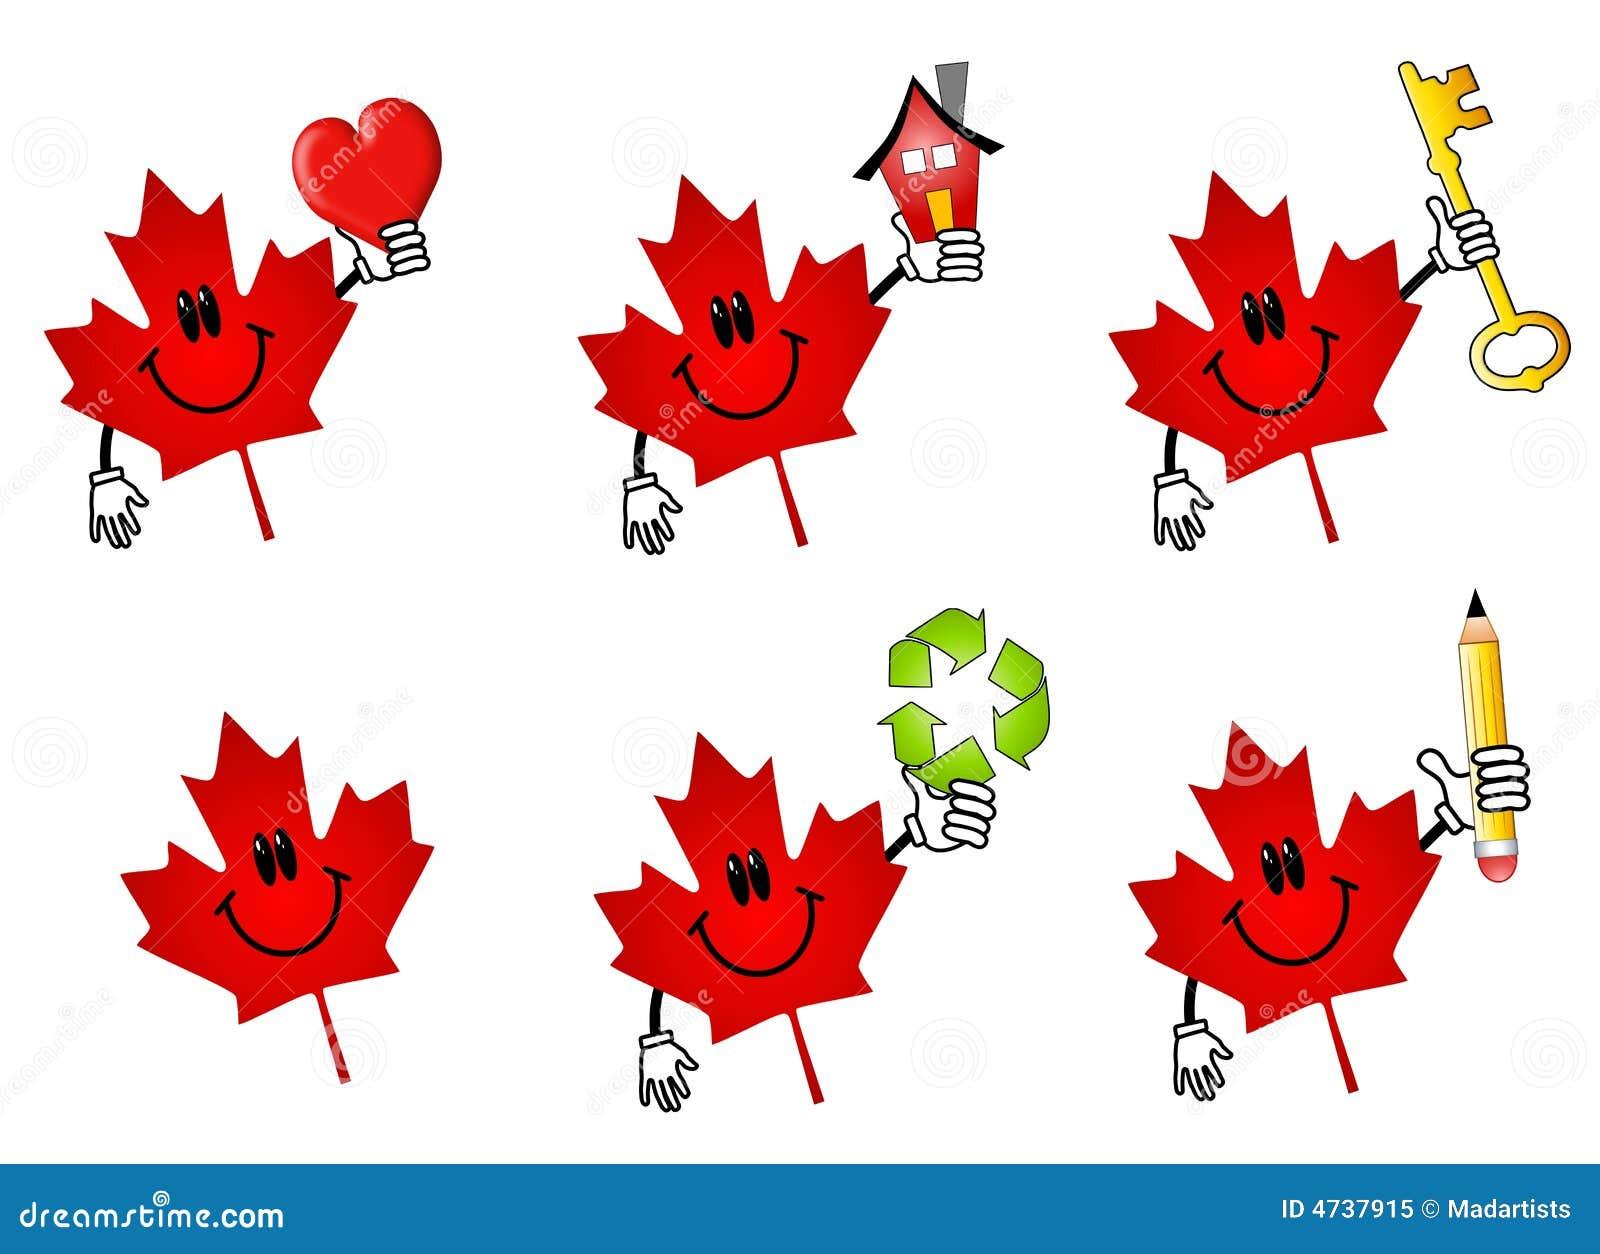 Canadian Maple Leaf Cartoons Royalty Free Stock Photo